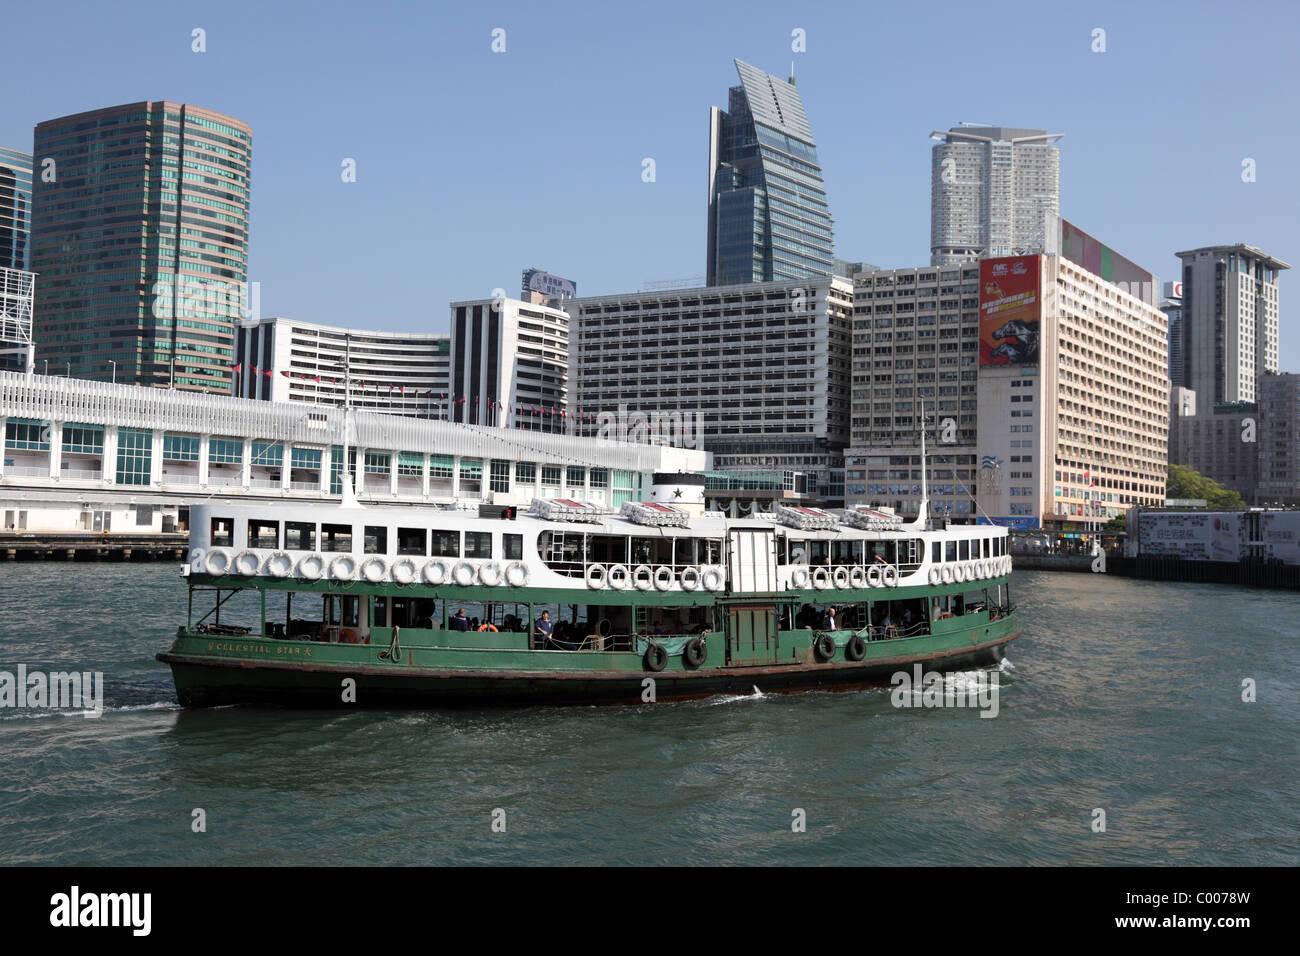 Celestial Star ferry ship in Hong Kong - Stock Image